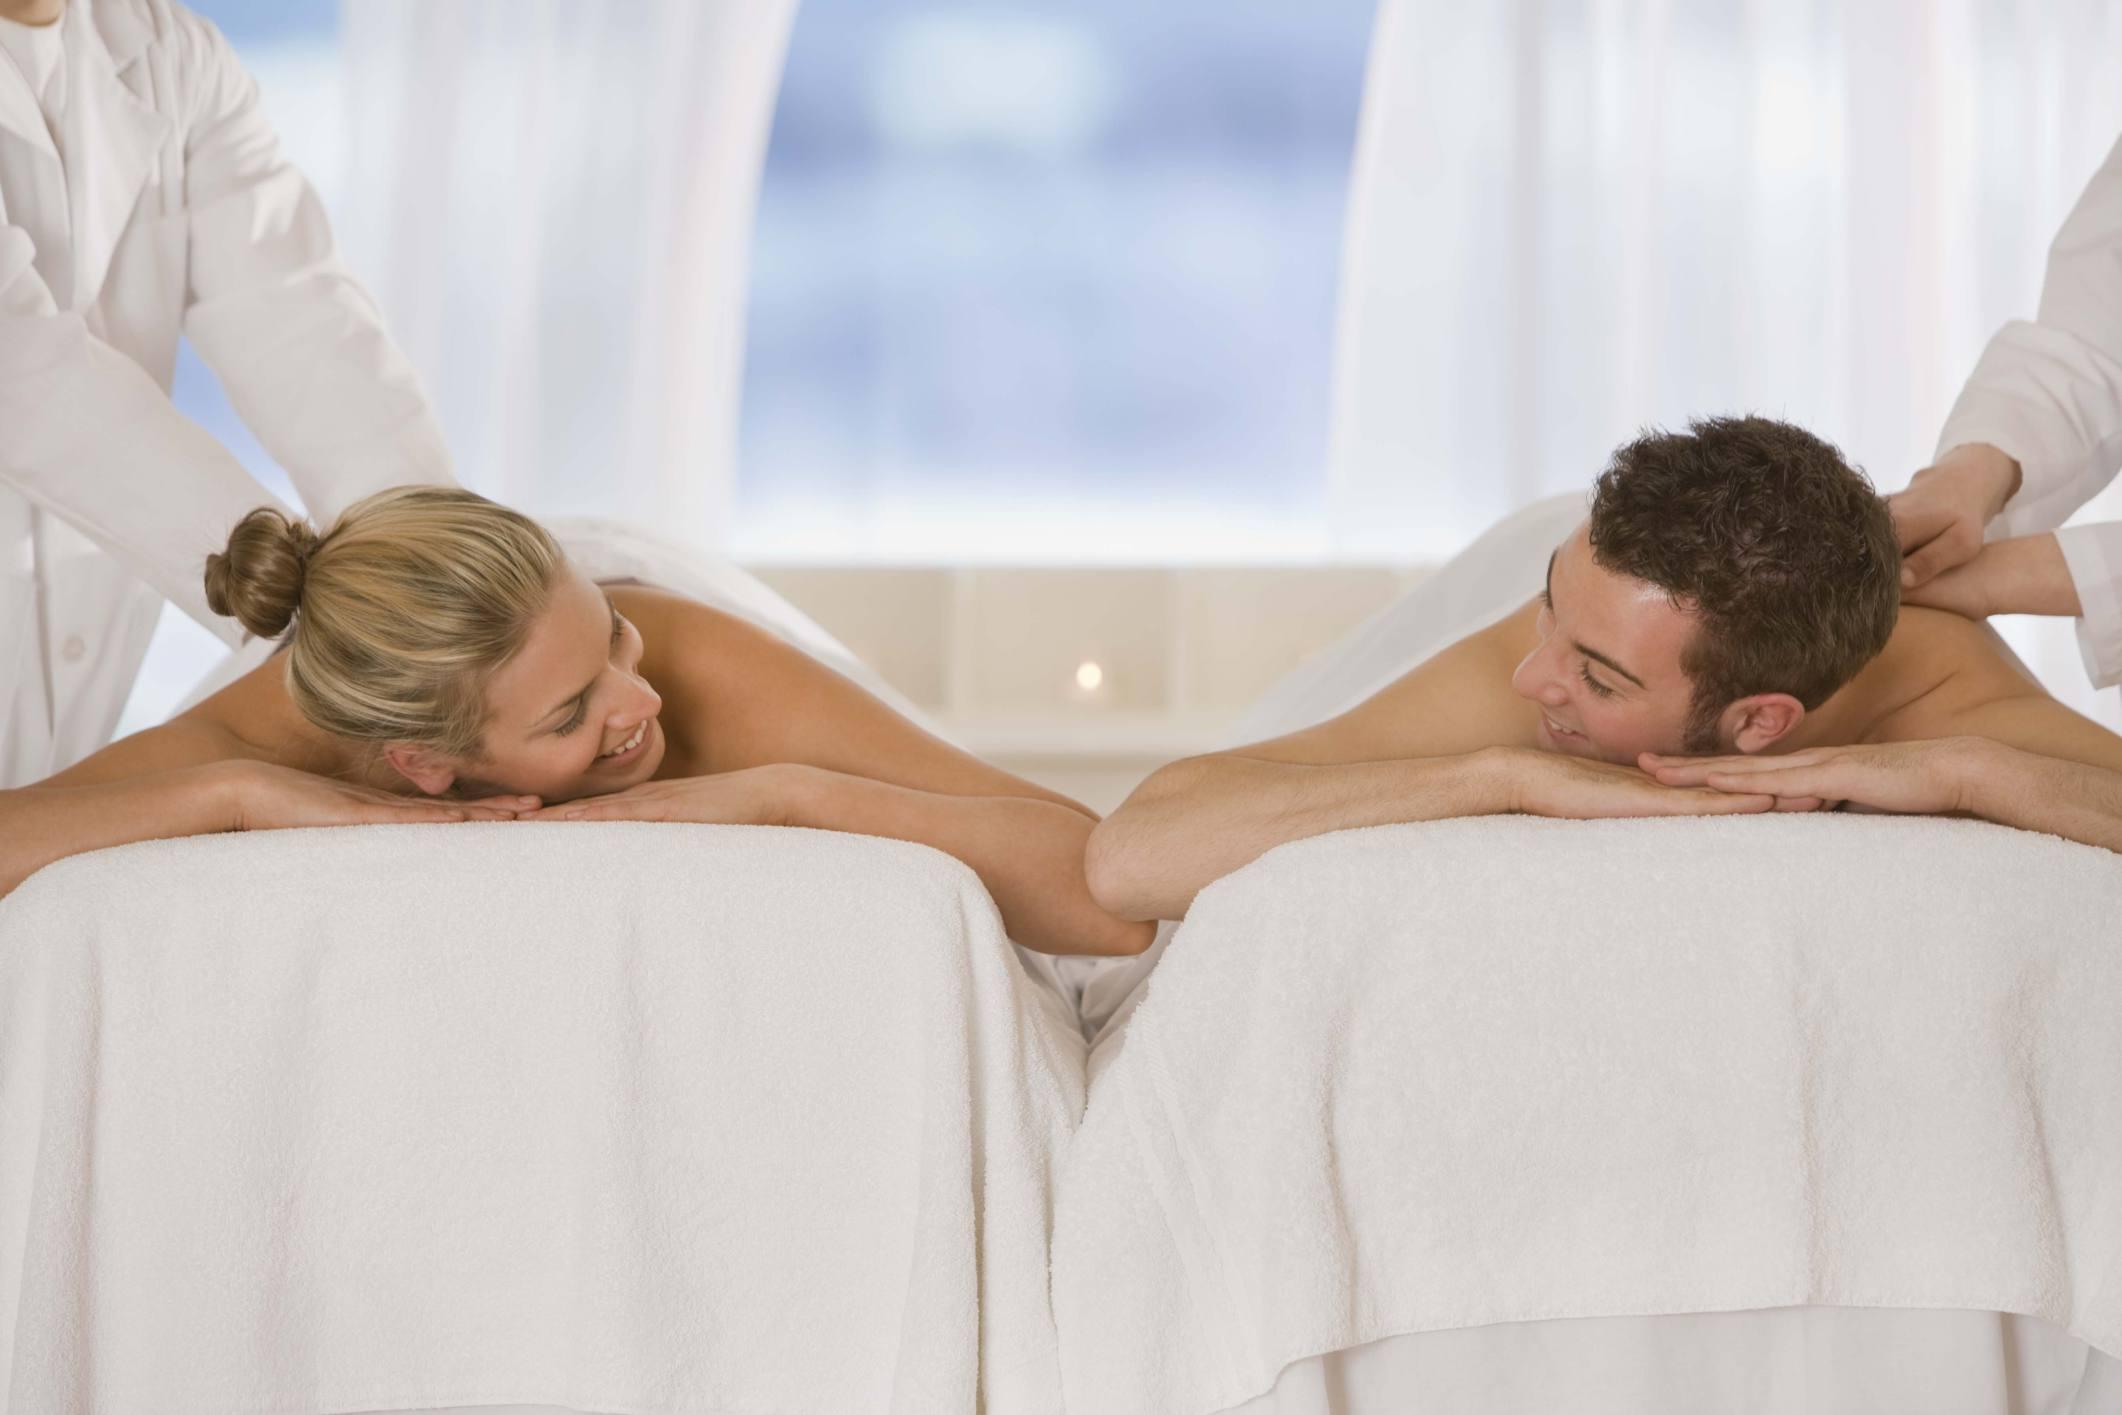 Image of a couple enjoying a massage together.